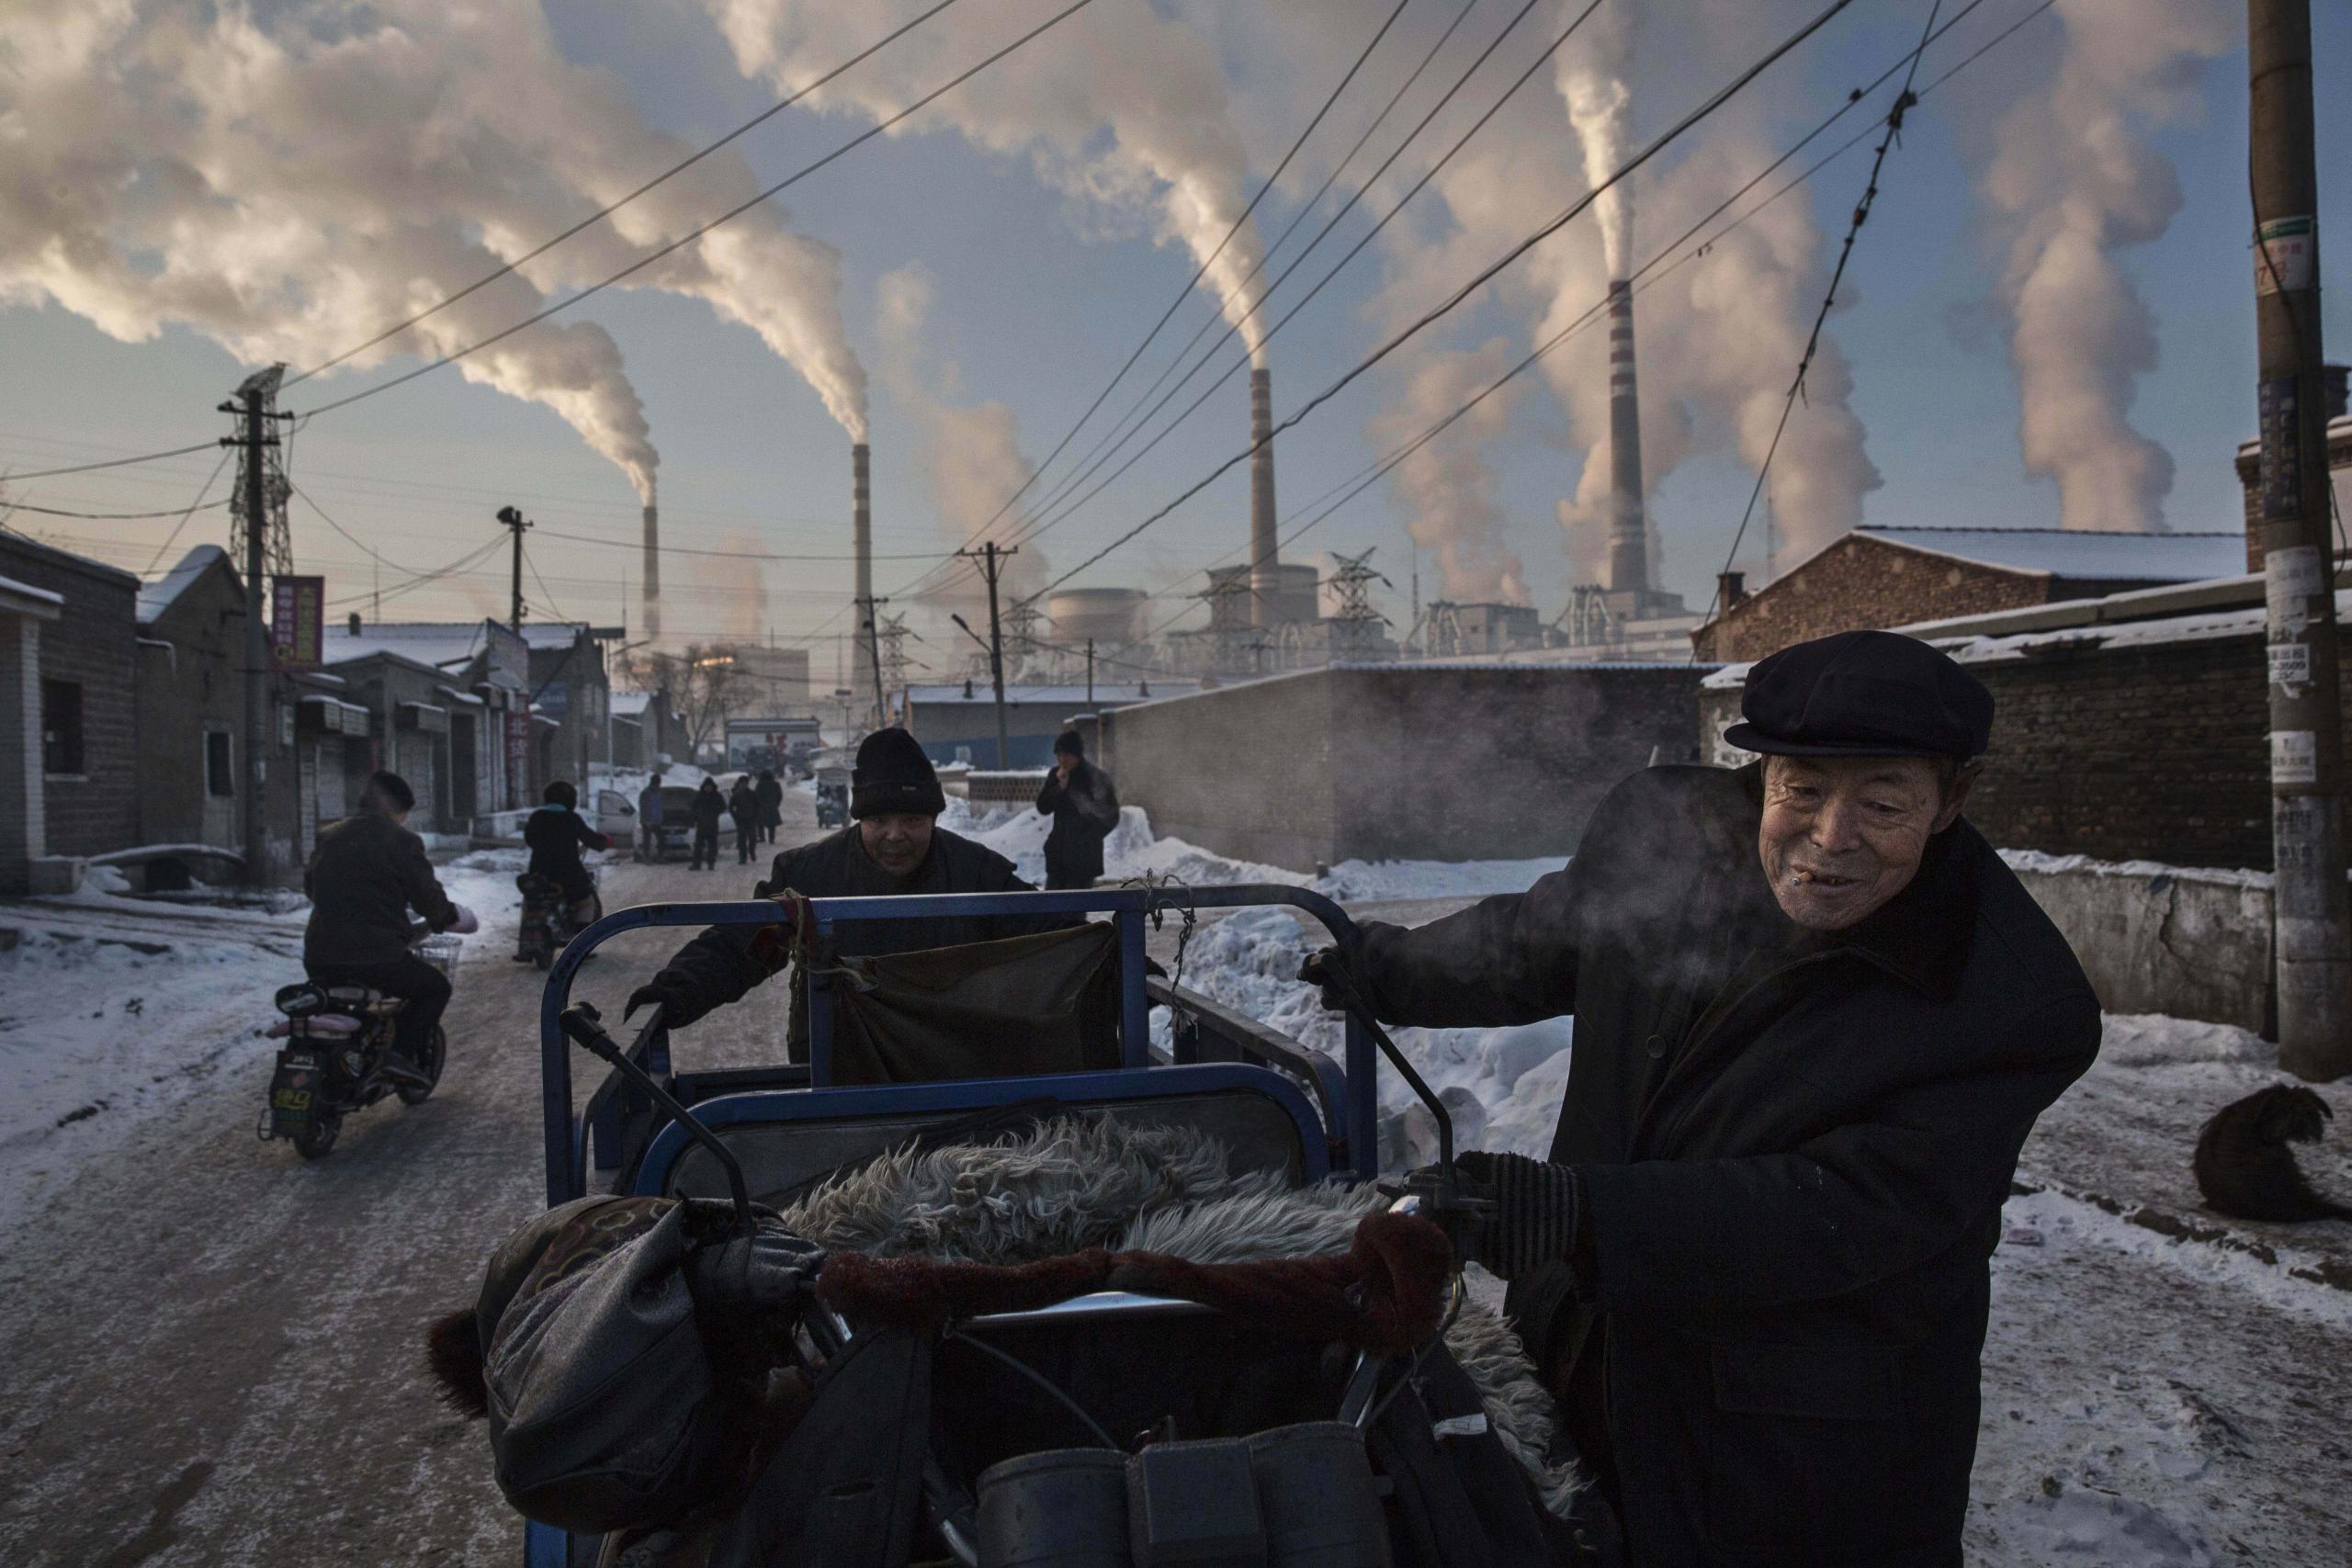 World Press Photo 2016 - Chinas Coal Addiction